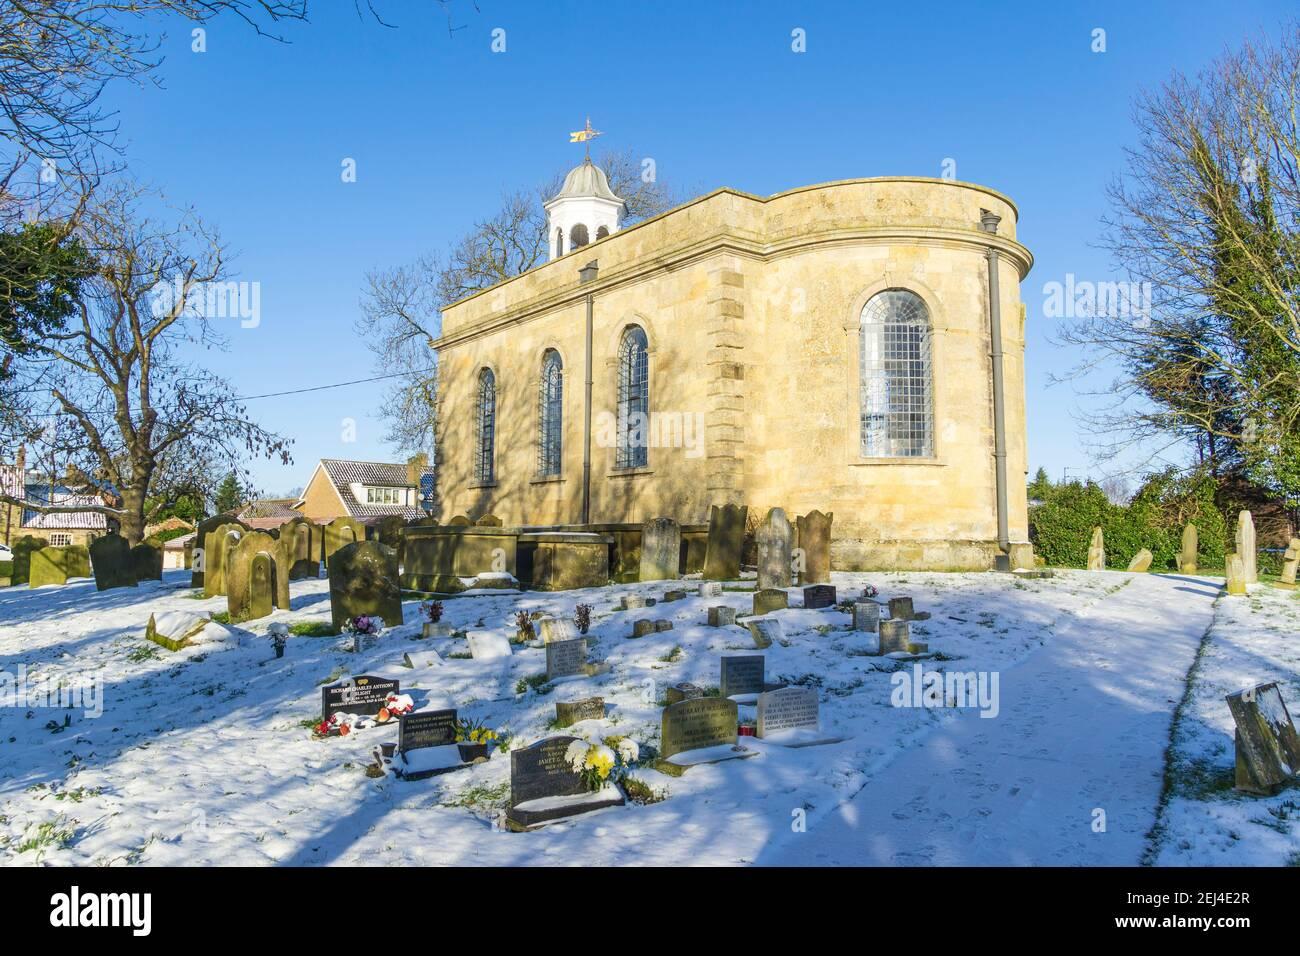 st-peter-and-st-pauls-church-cherry-wilingham-in-winter-2EJ4E2R.jpg